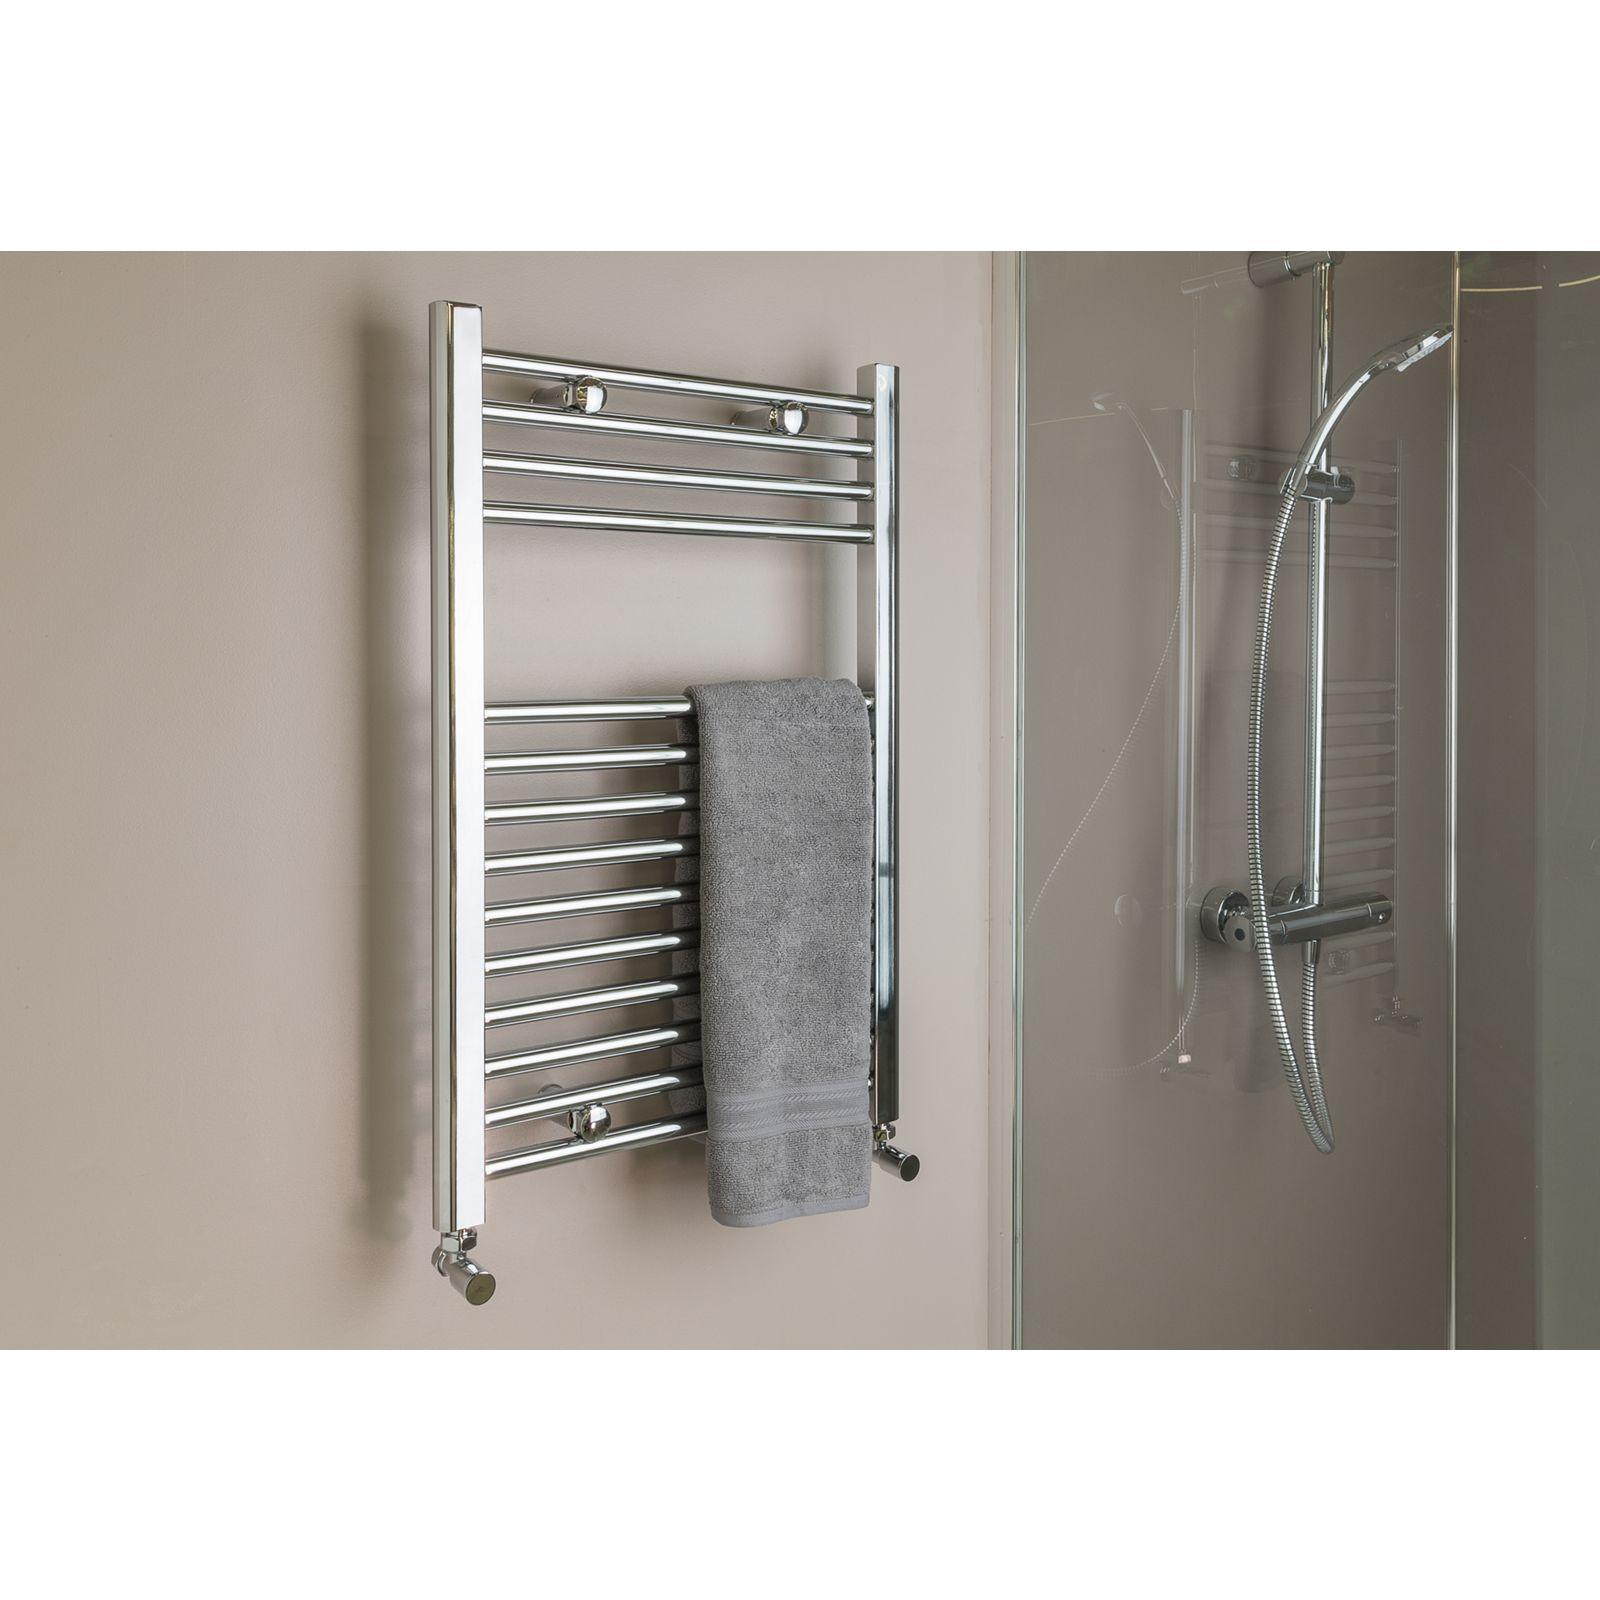 Qual-Rad Heated Towel Rail / Warmer / Radiator – Central Heating 4